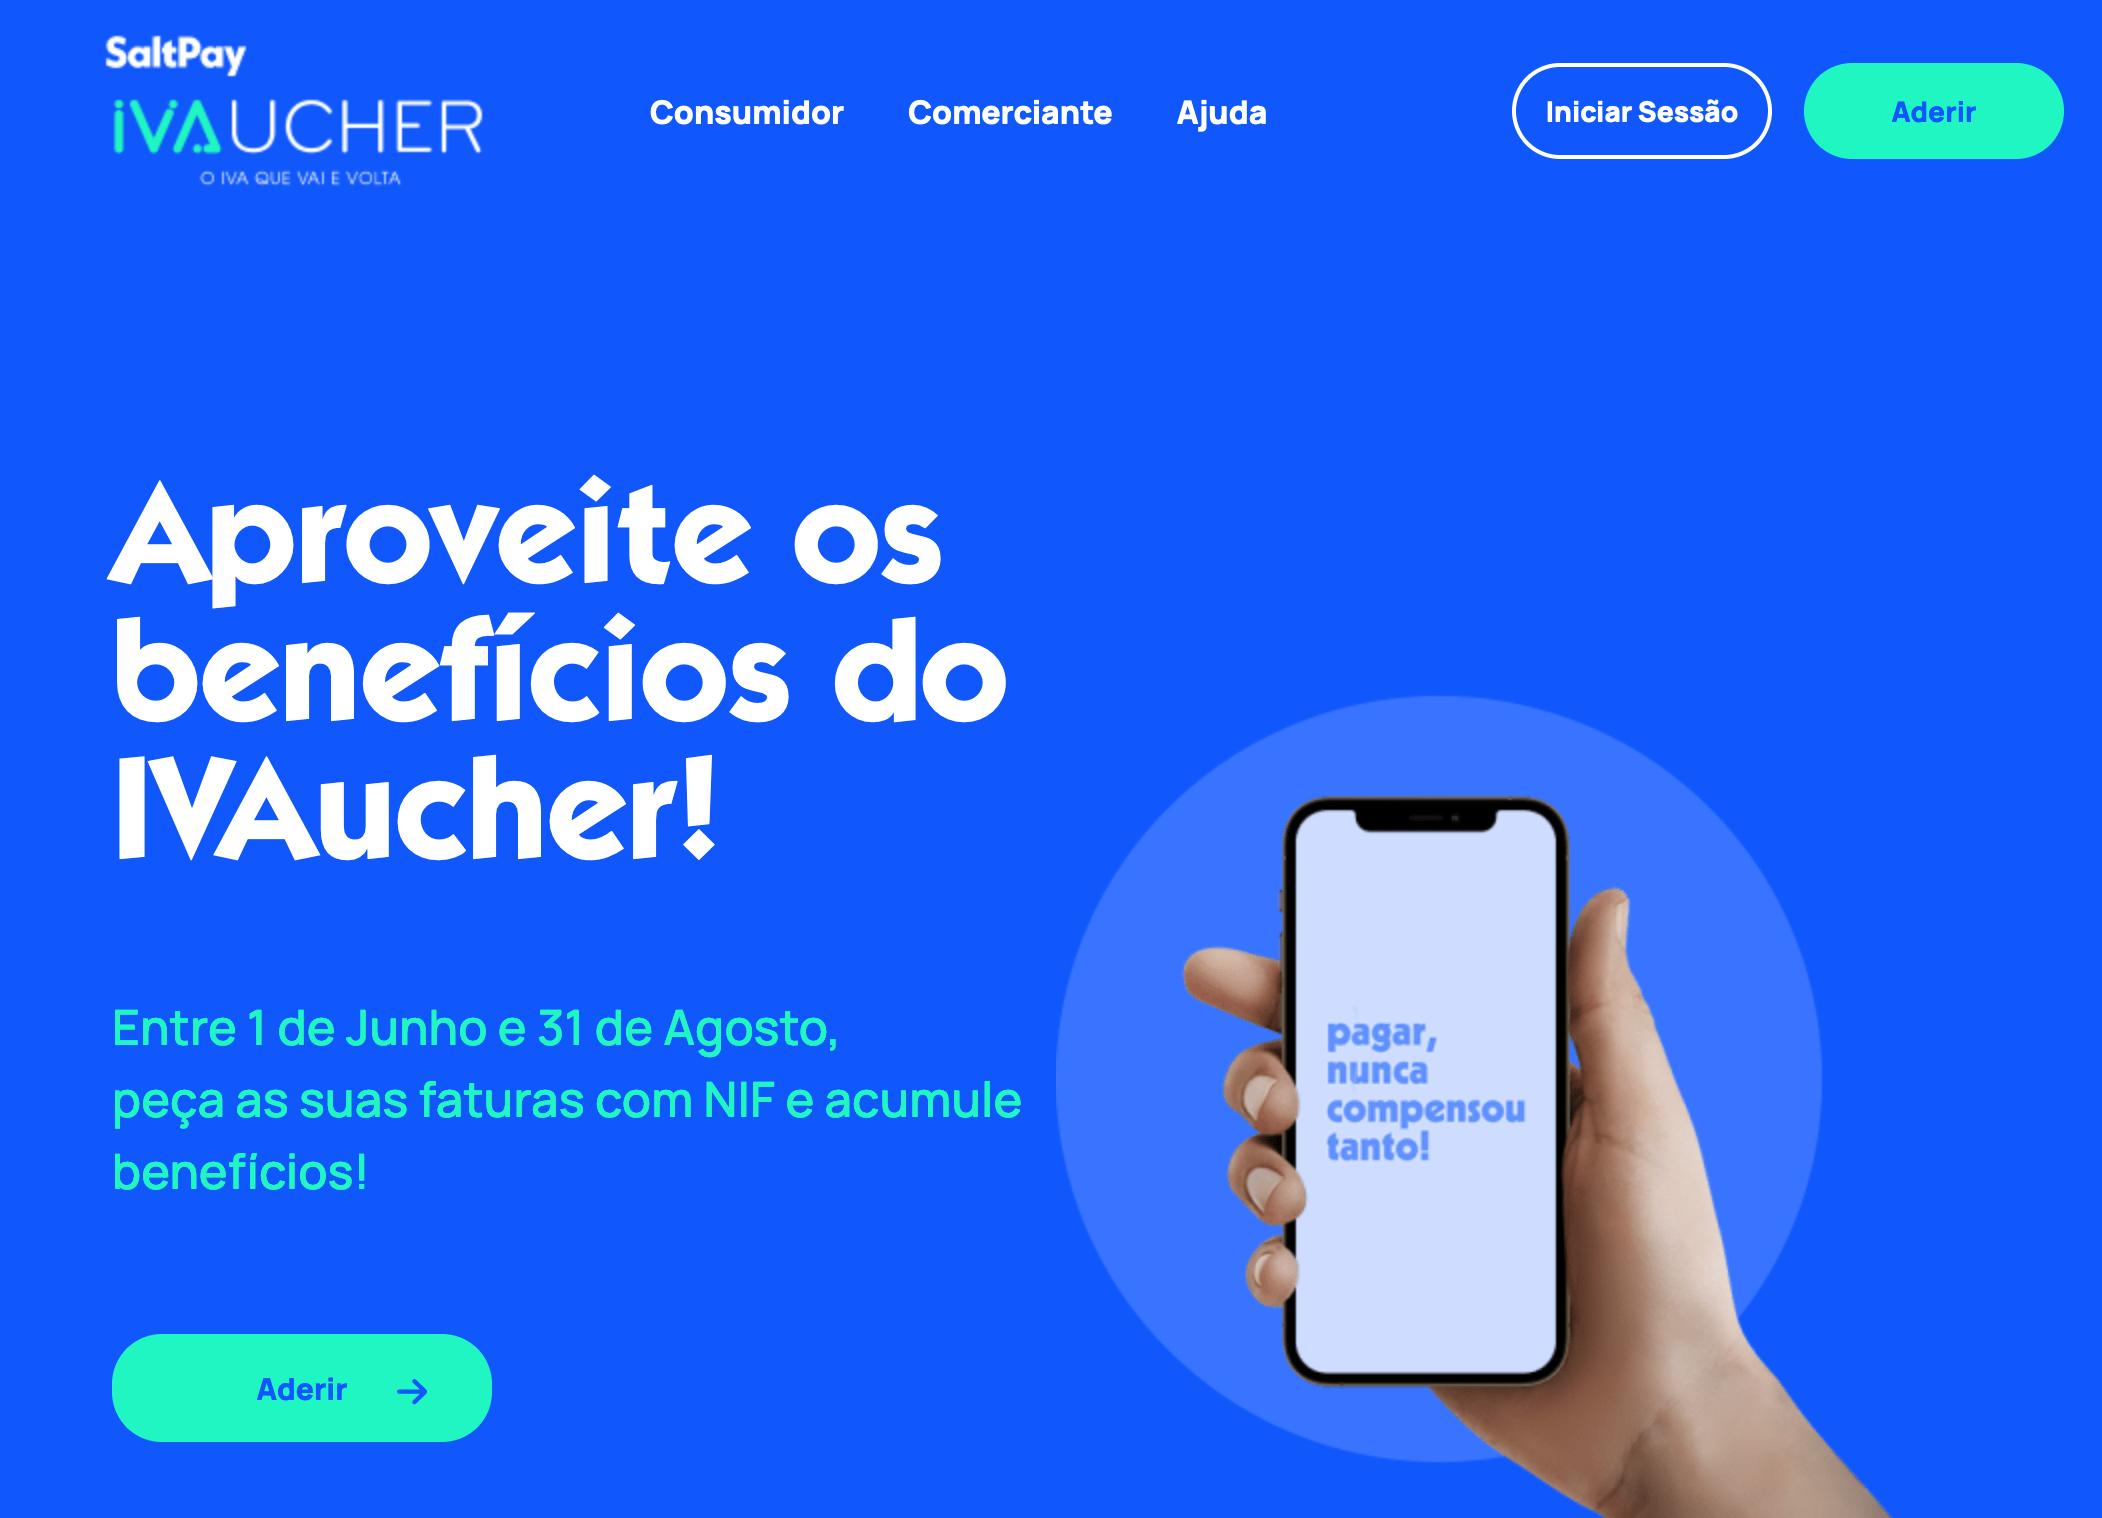 BQ Advogadas - IVAucher, site, captura de ecran